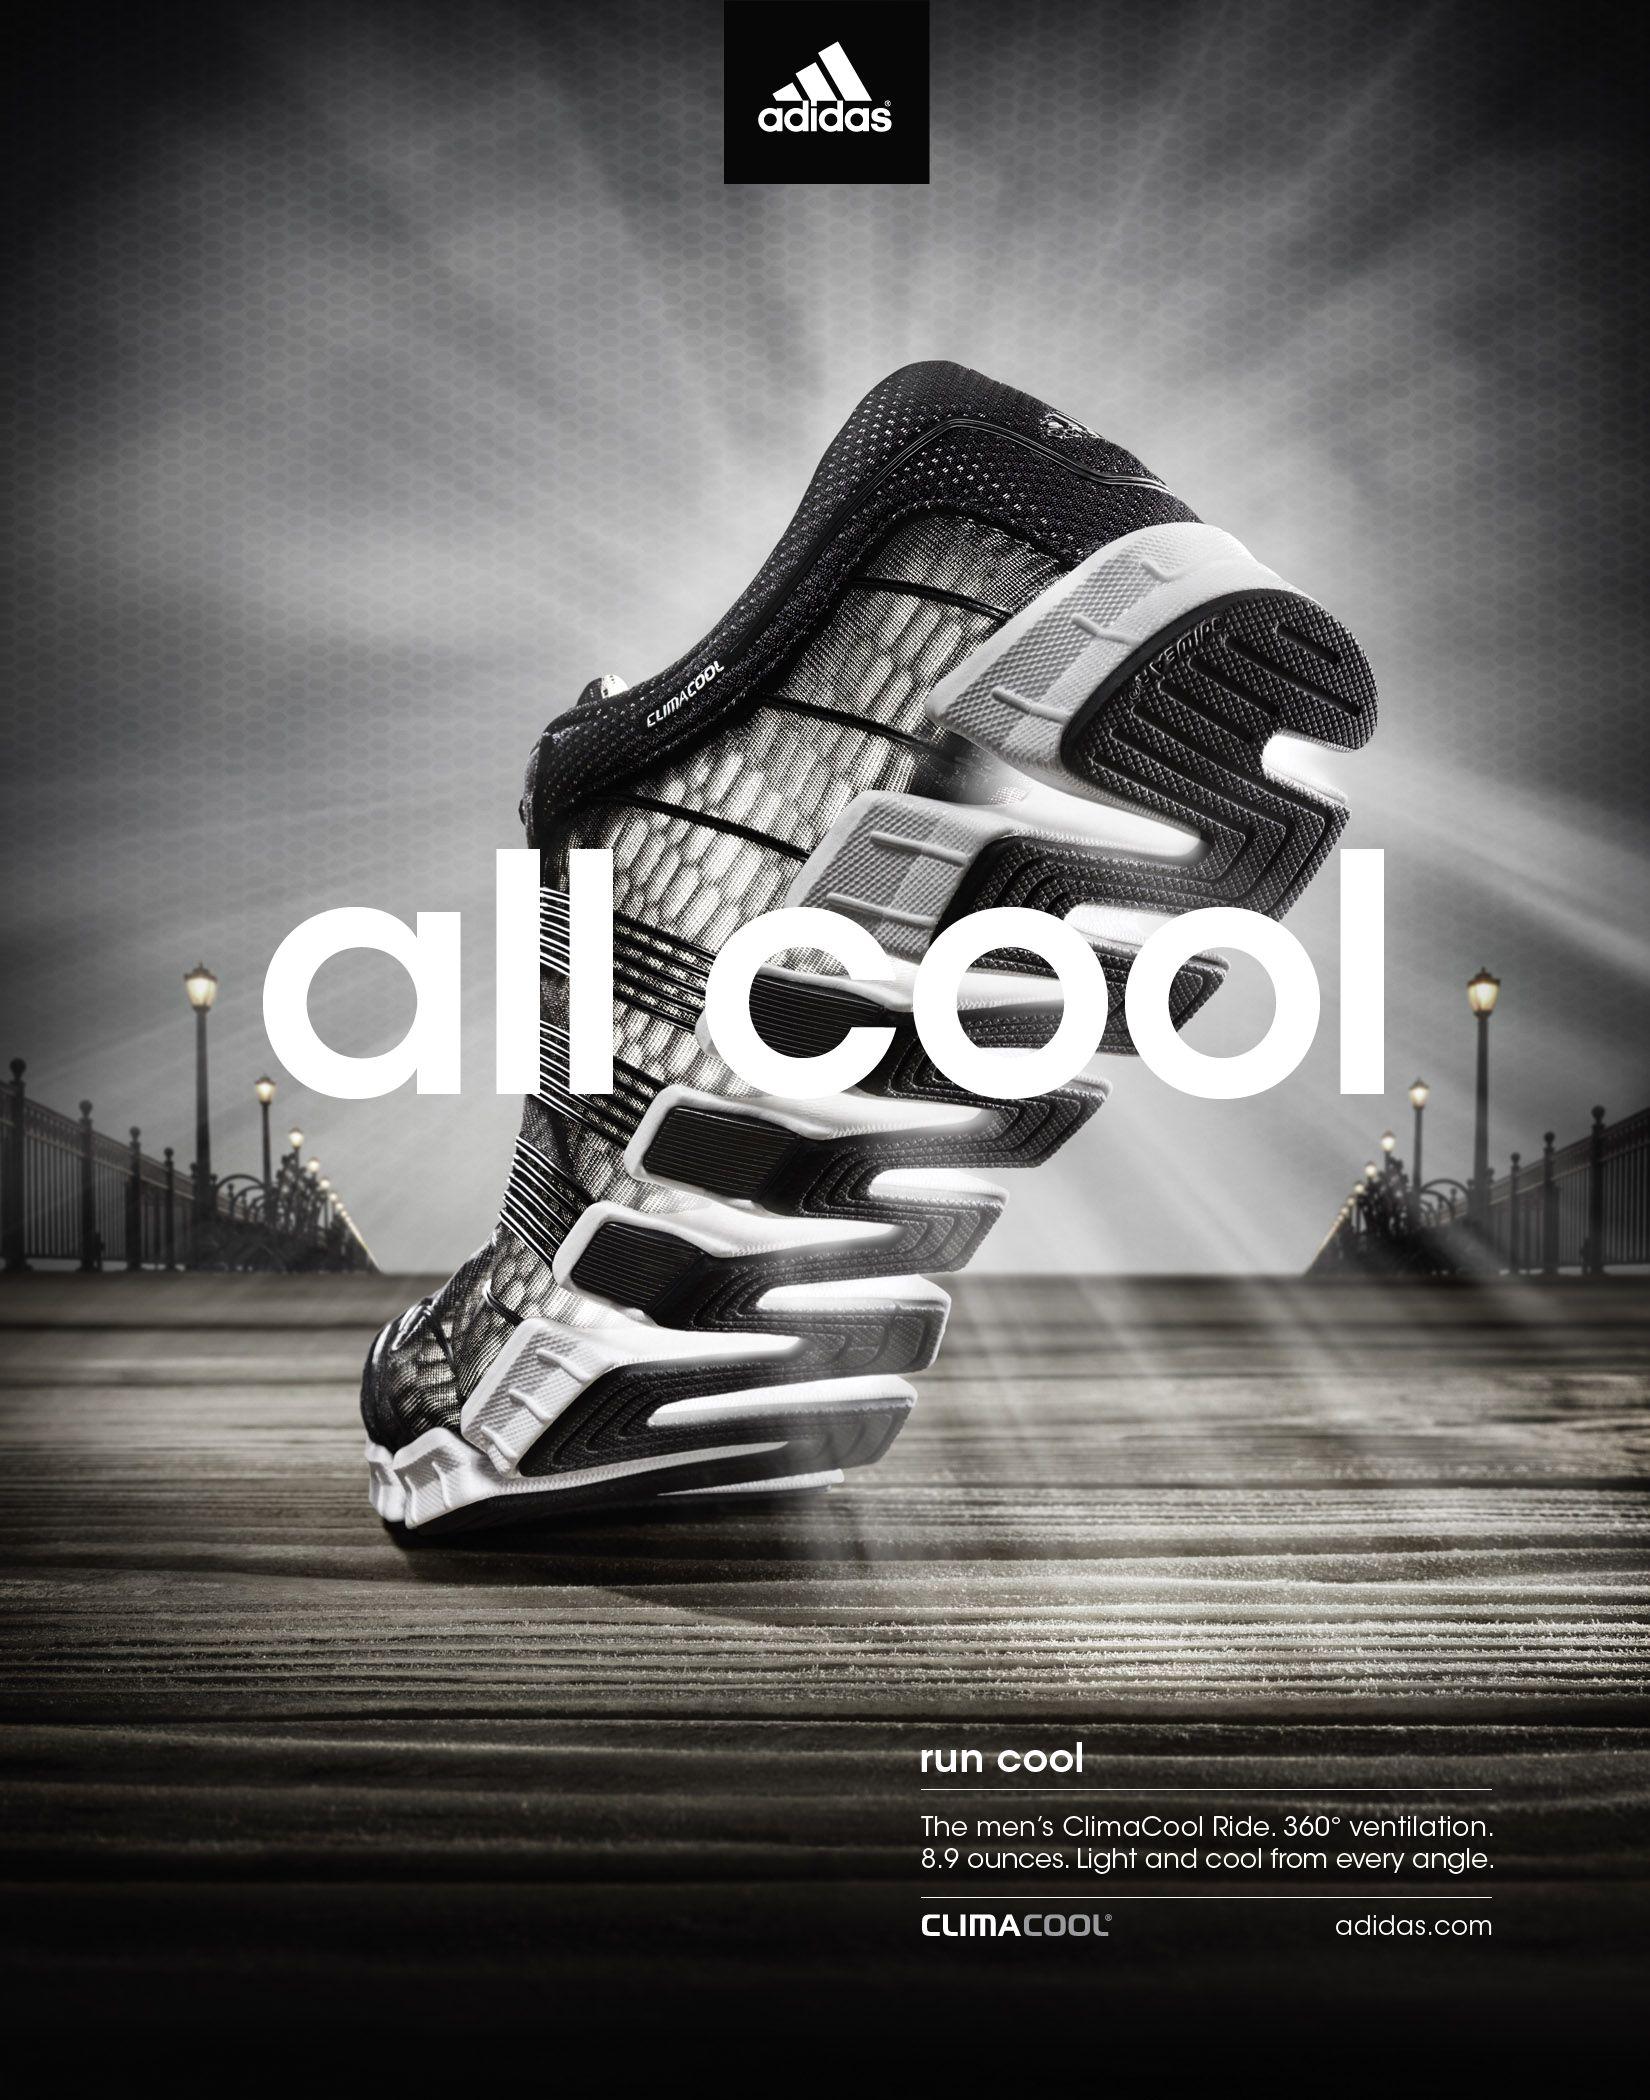 Adidas Advertising Loghi Sfondi